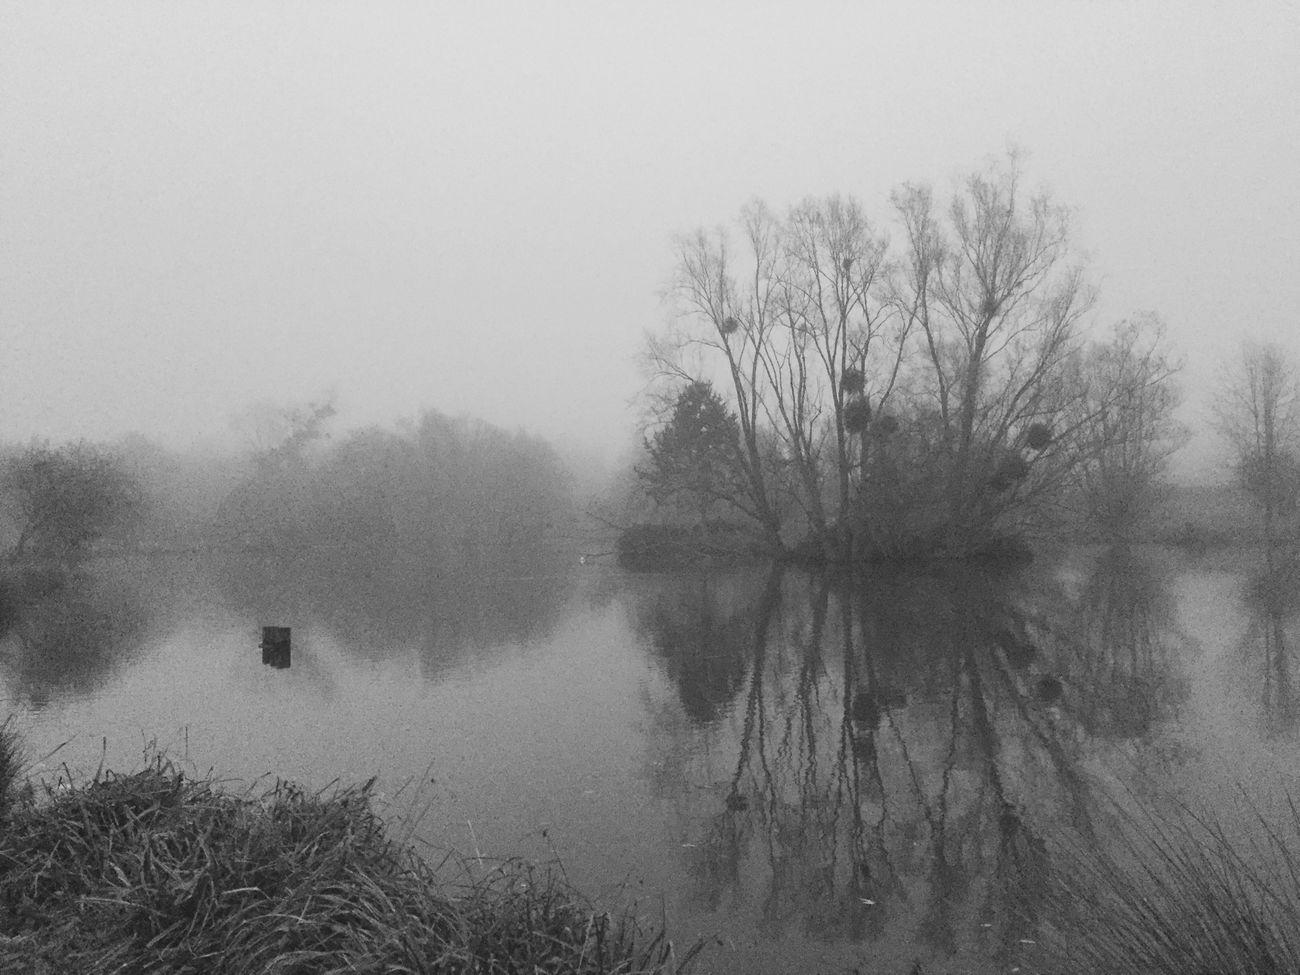 Fog Foggy Foggy Day Brouillard Brume Lac Seine Et Marne Landscape Nature Paysage 77 Lake Etangs Reflection Iphone6plus IPhoneography